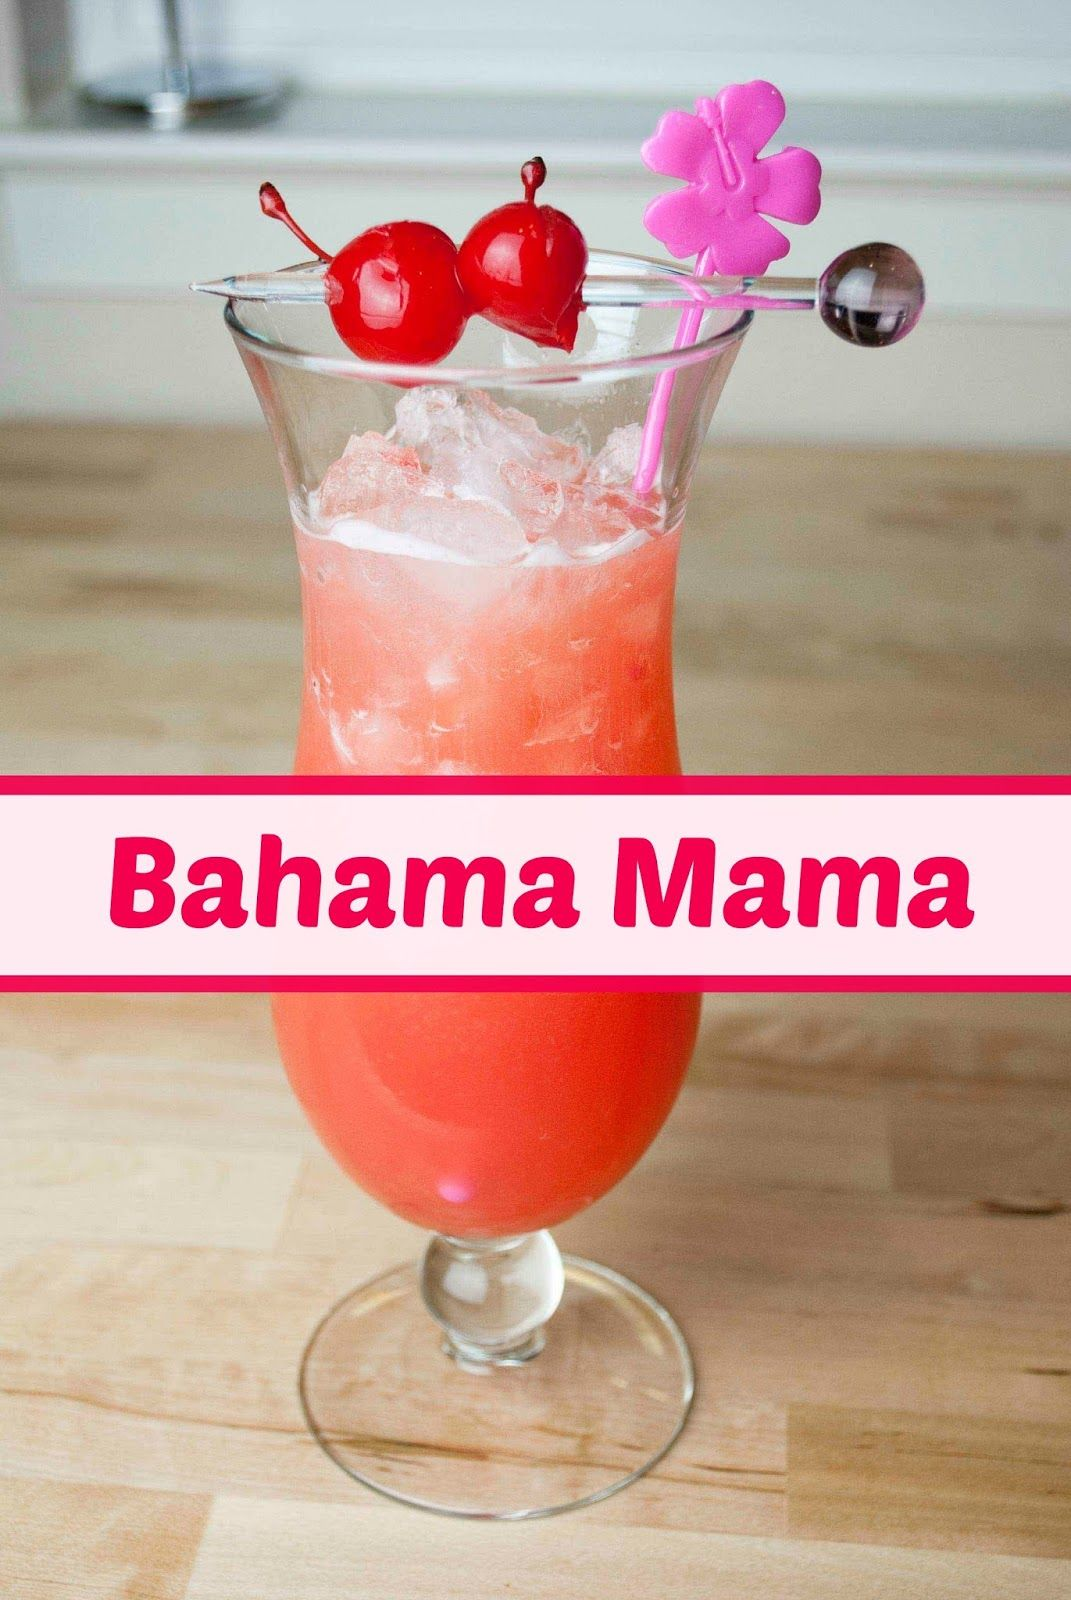 Bahama Mama Coconut Rum Drinks Cocktail Recipes Easy Coconut